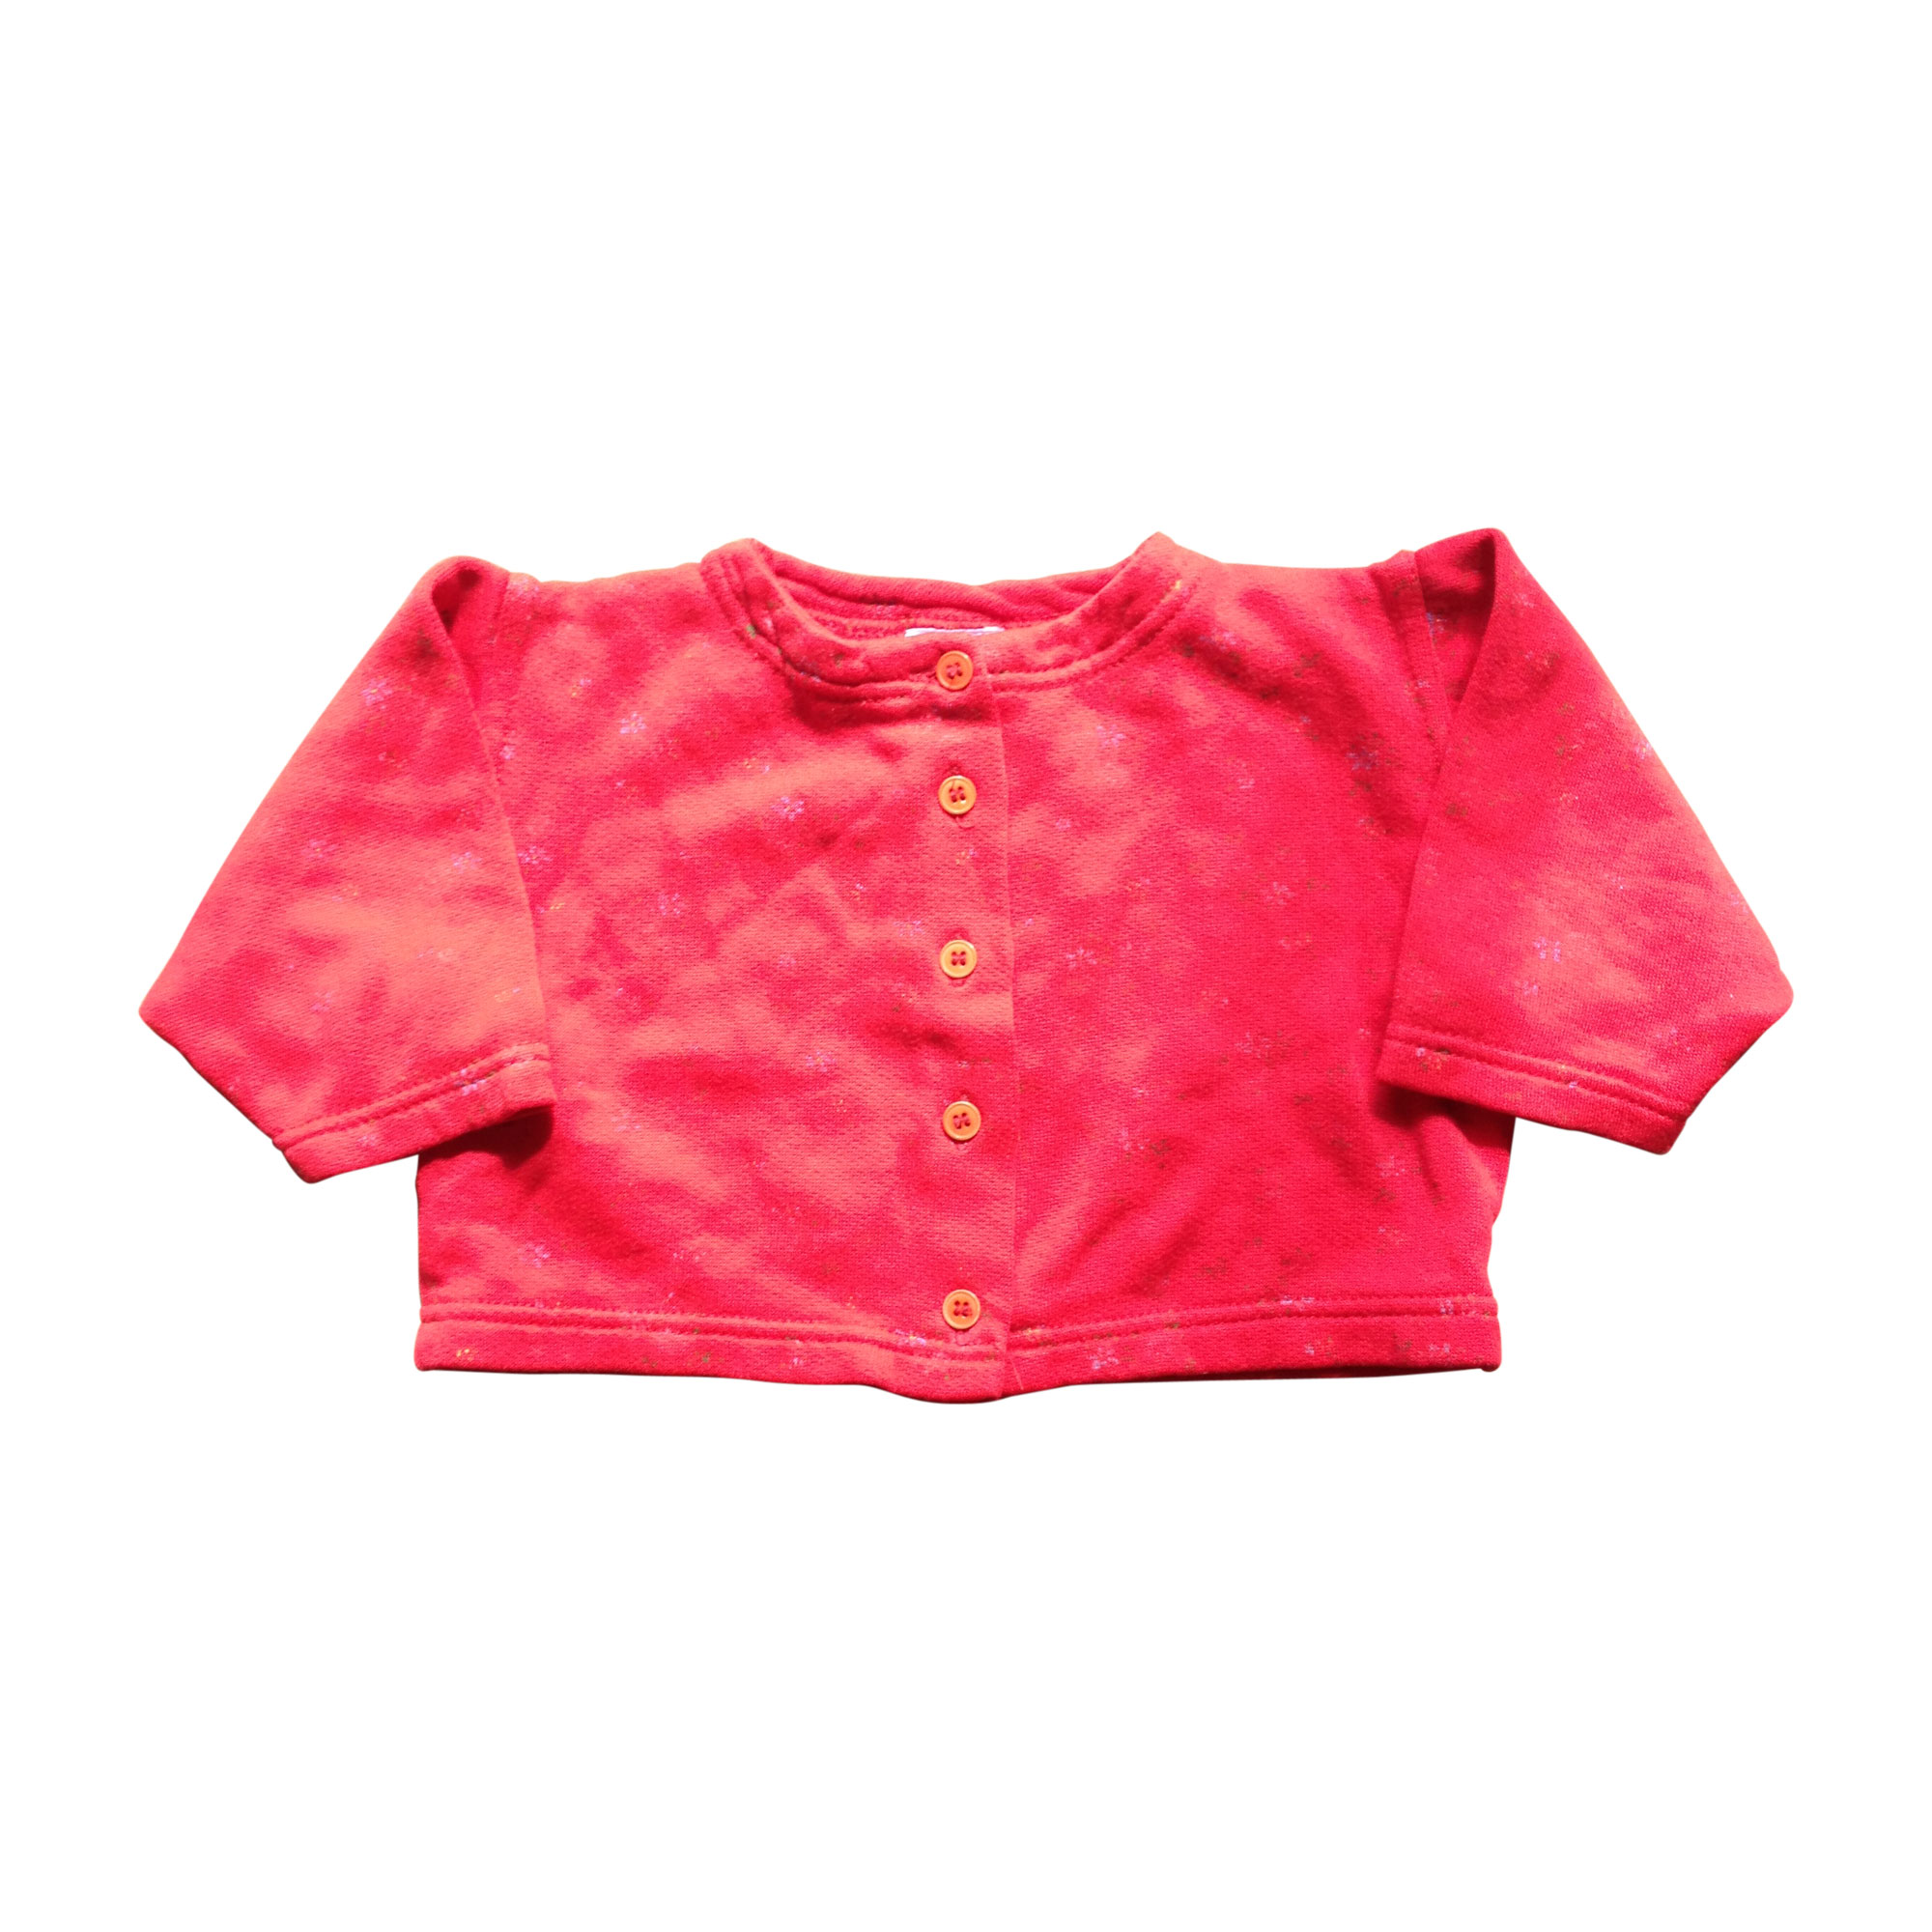 Vest, Cardigan JACADI Red, burgundy